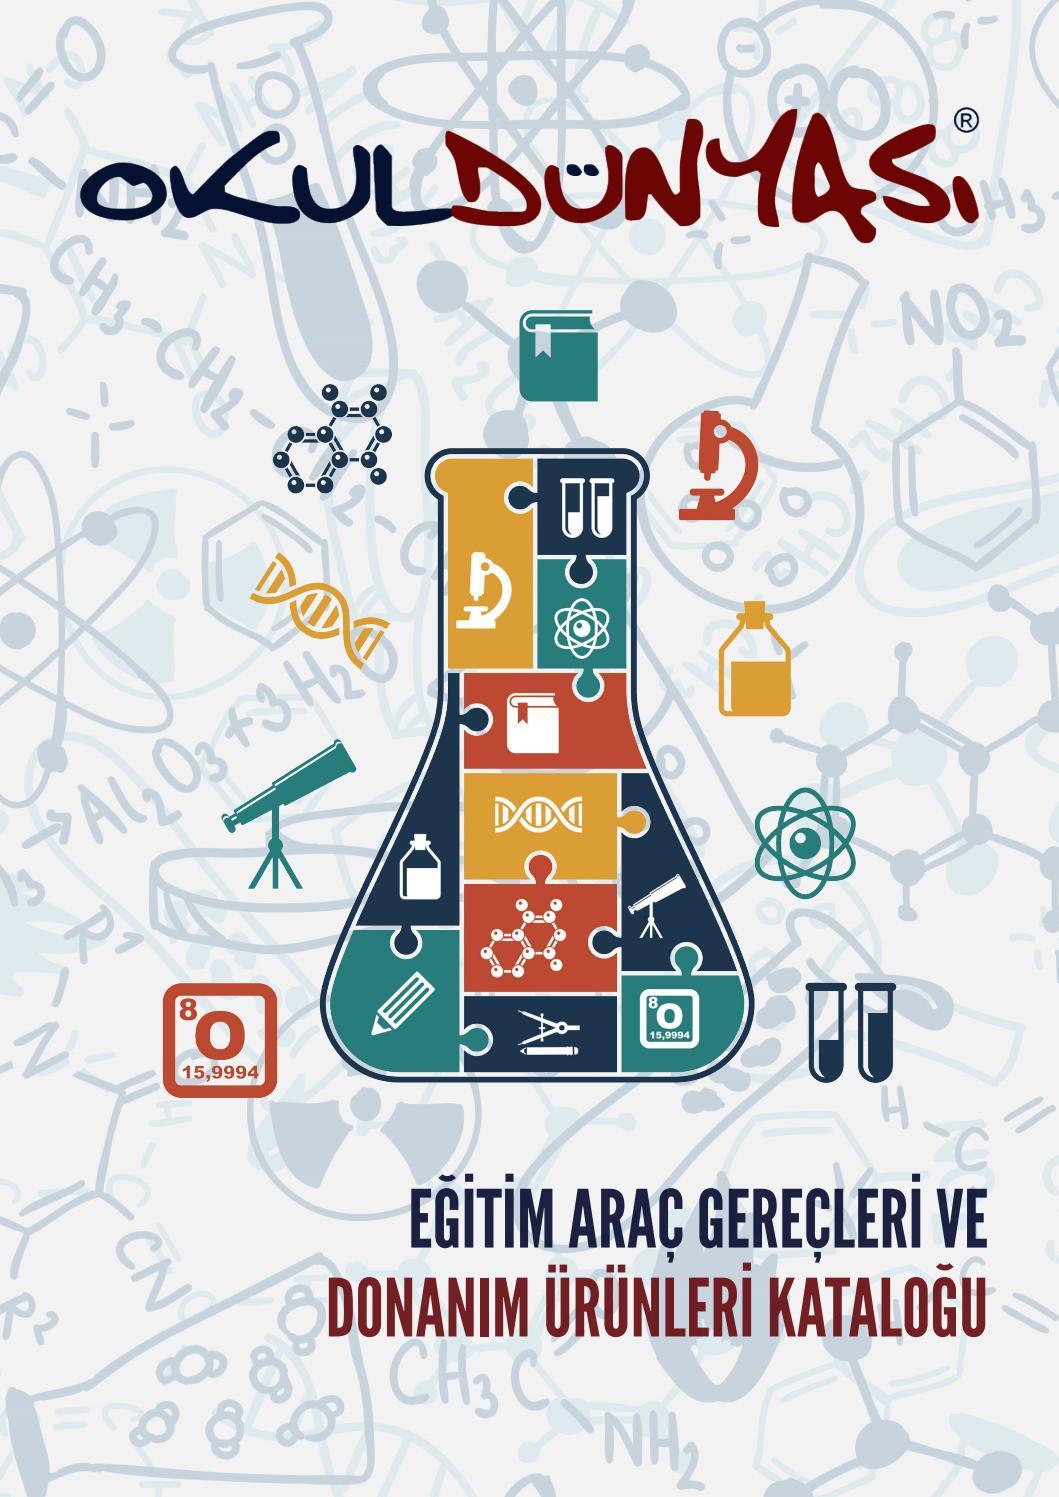 Okul Dünyası Katalog By Yenilab - Issuu destiné Tangram Cycle 3